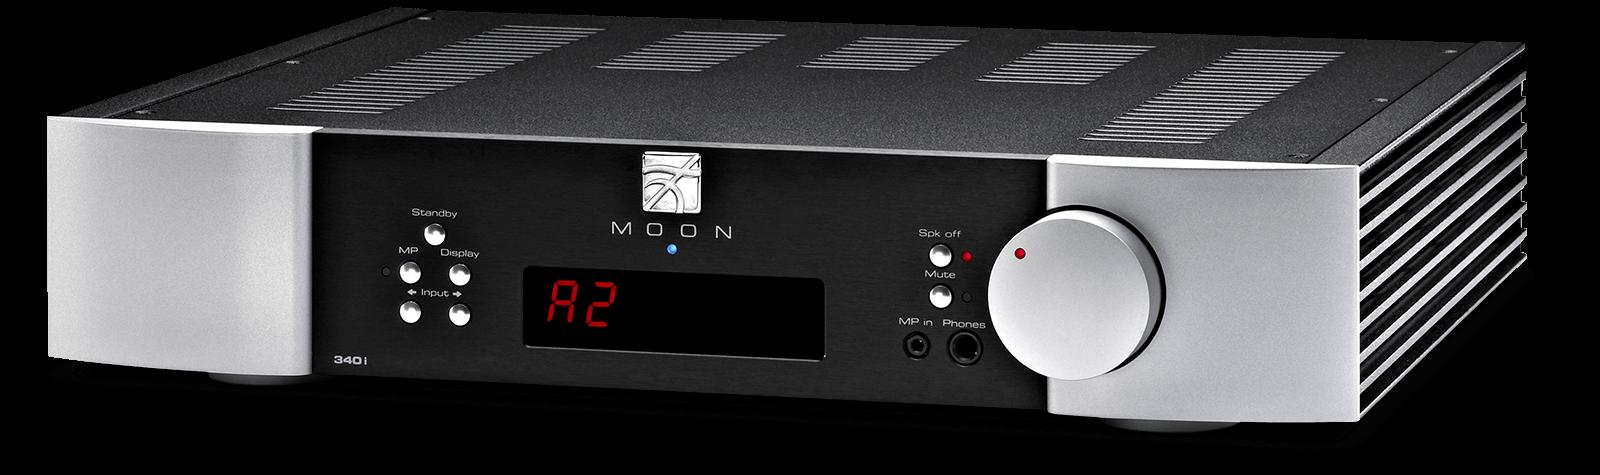 Moon, 340iX